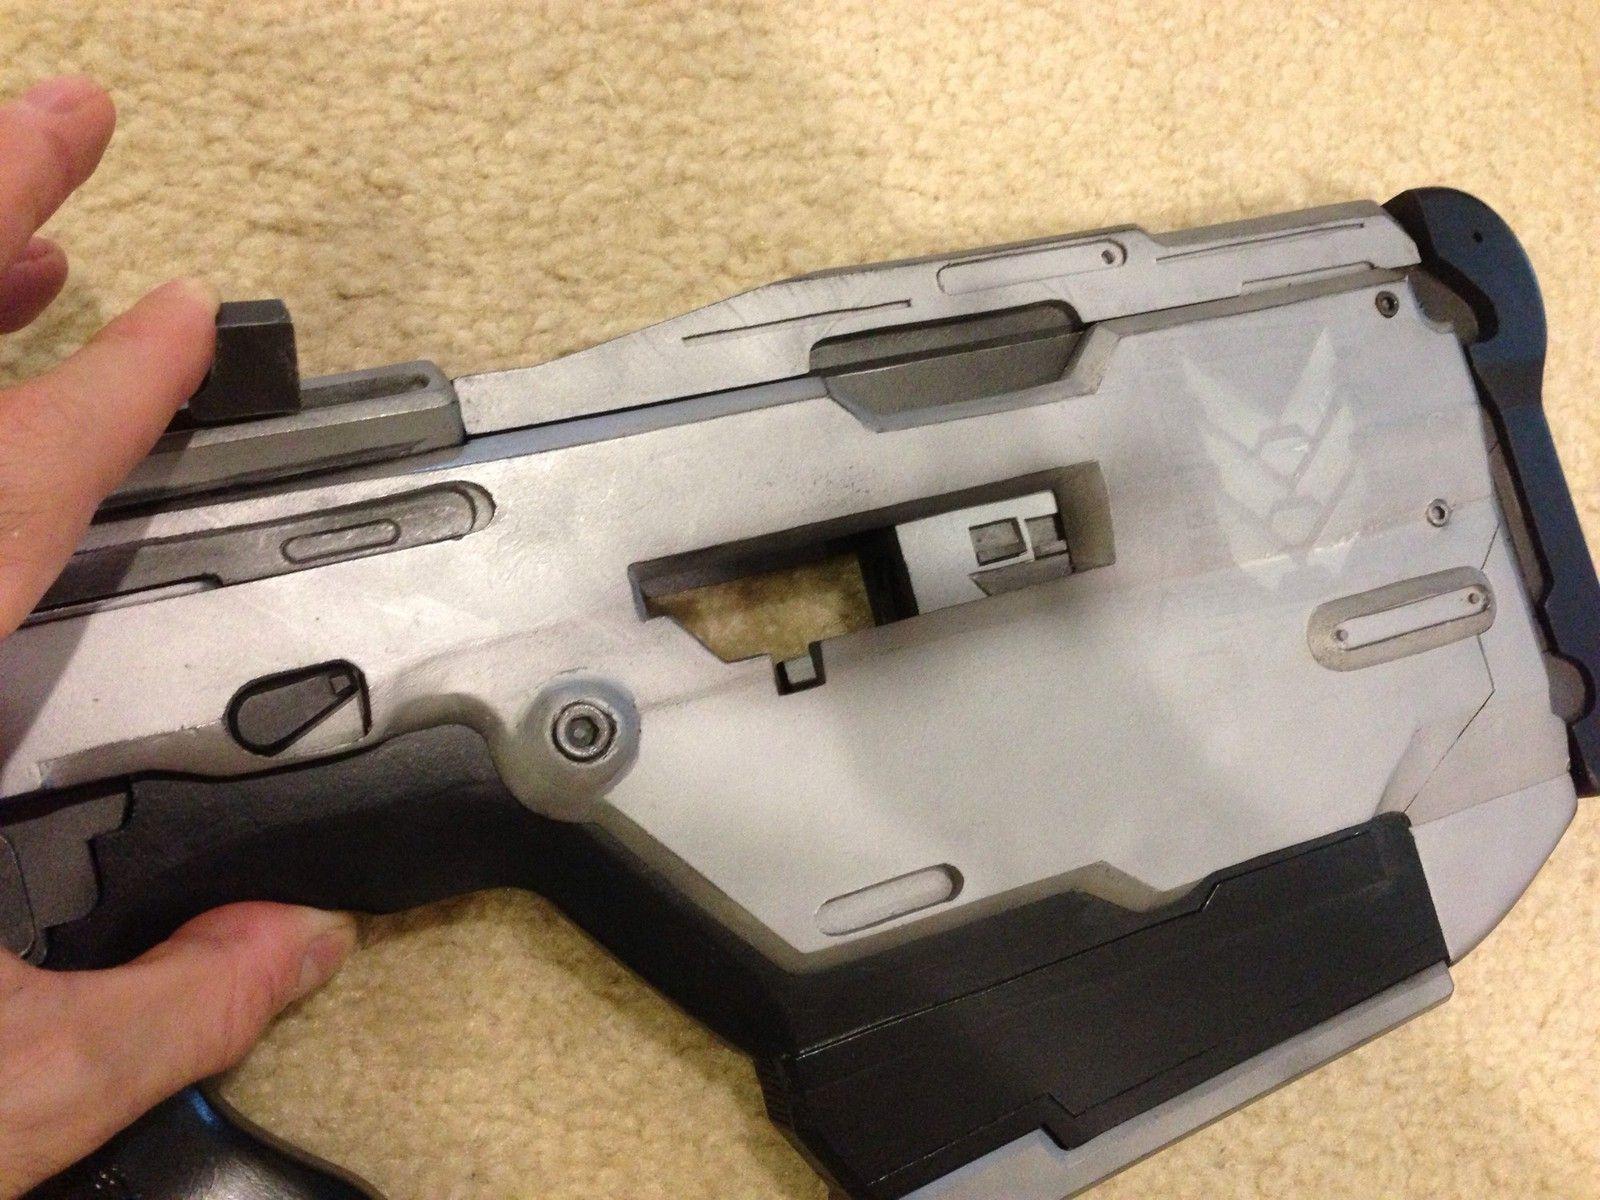 Halo 4 Full Size Replica BR85HB Battle Rifle Professionally